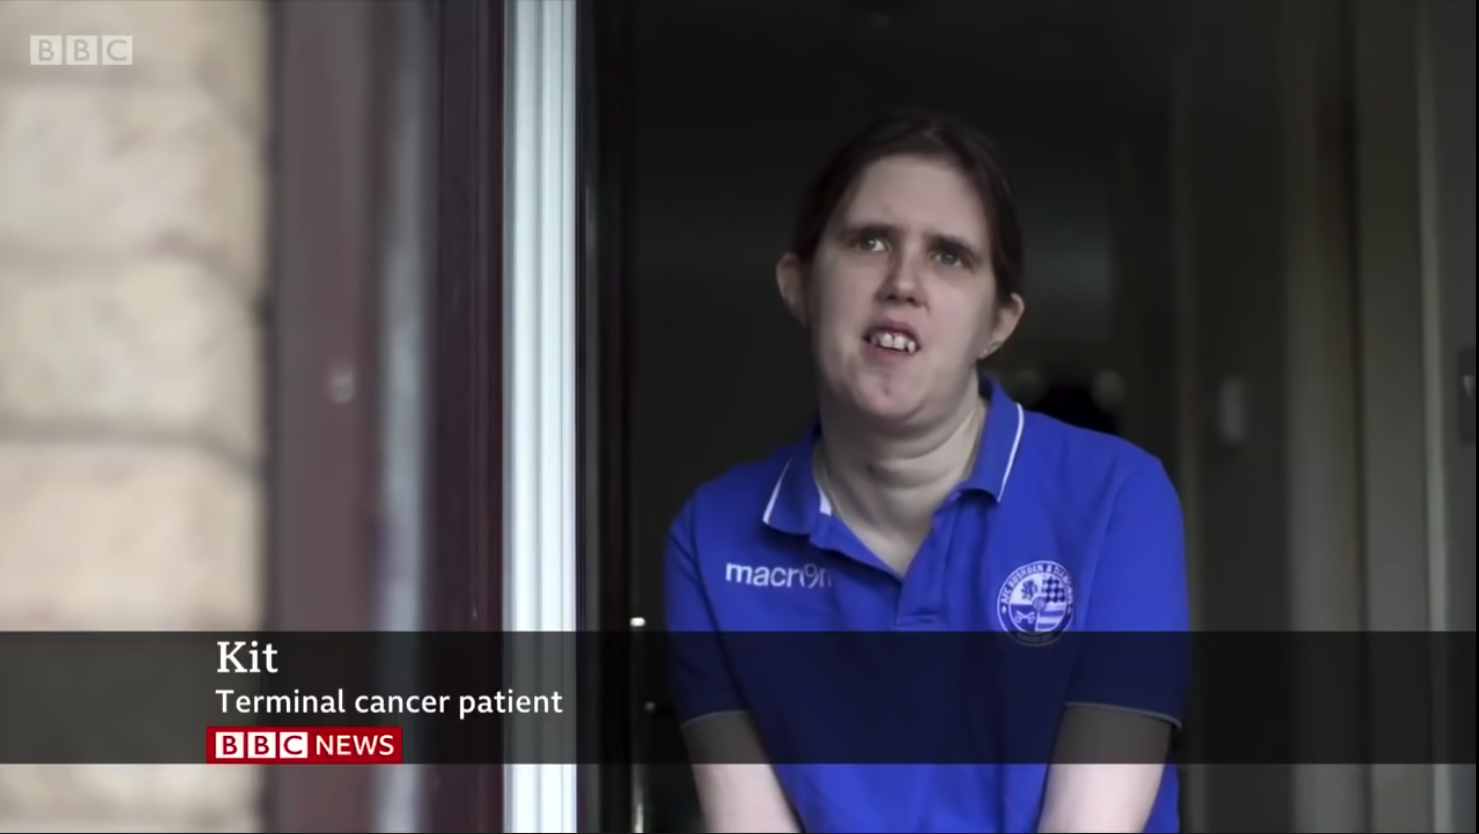 METUP Member Kit appearing on BBC News